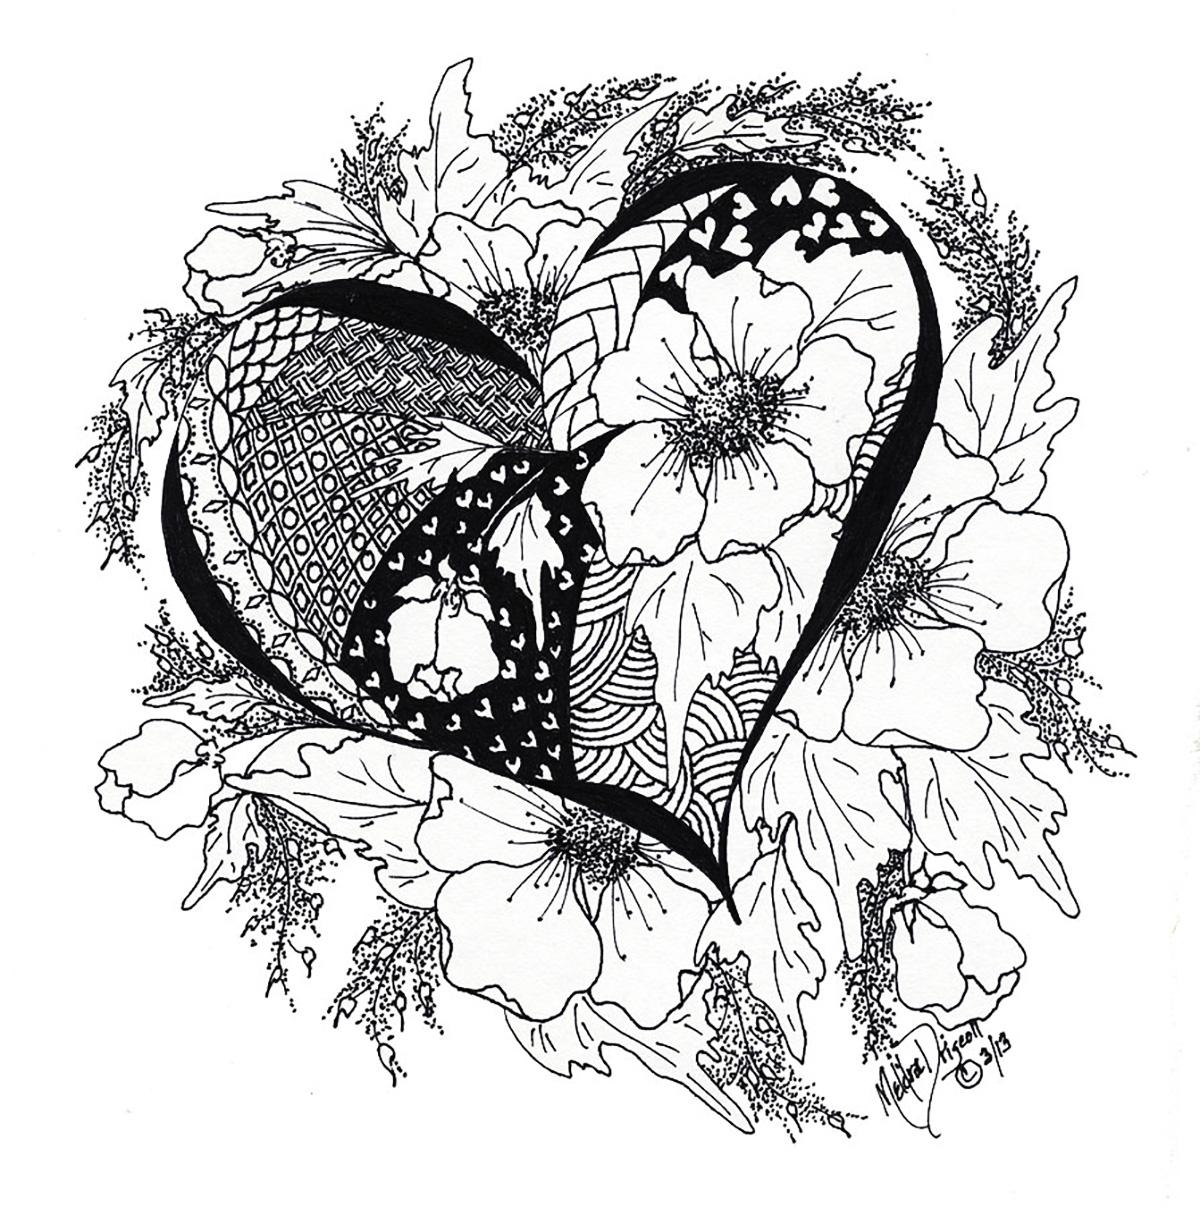 Coeur Amour 5 Anti Stress Art Therapie Coloriages Difficiles